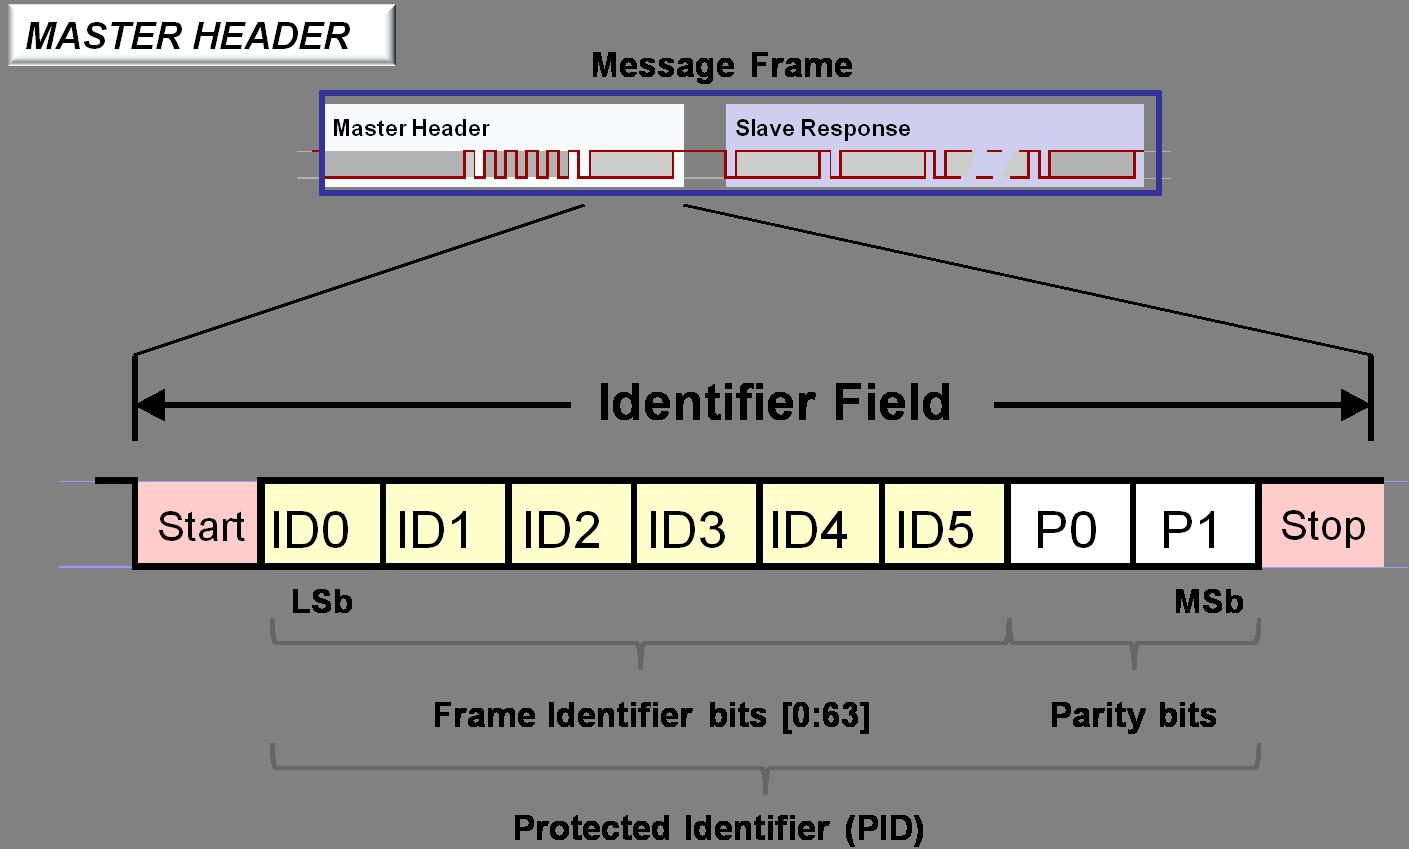 master-header-identifier-field.png